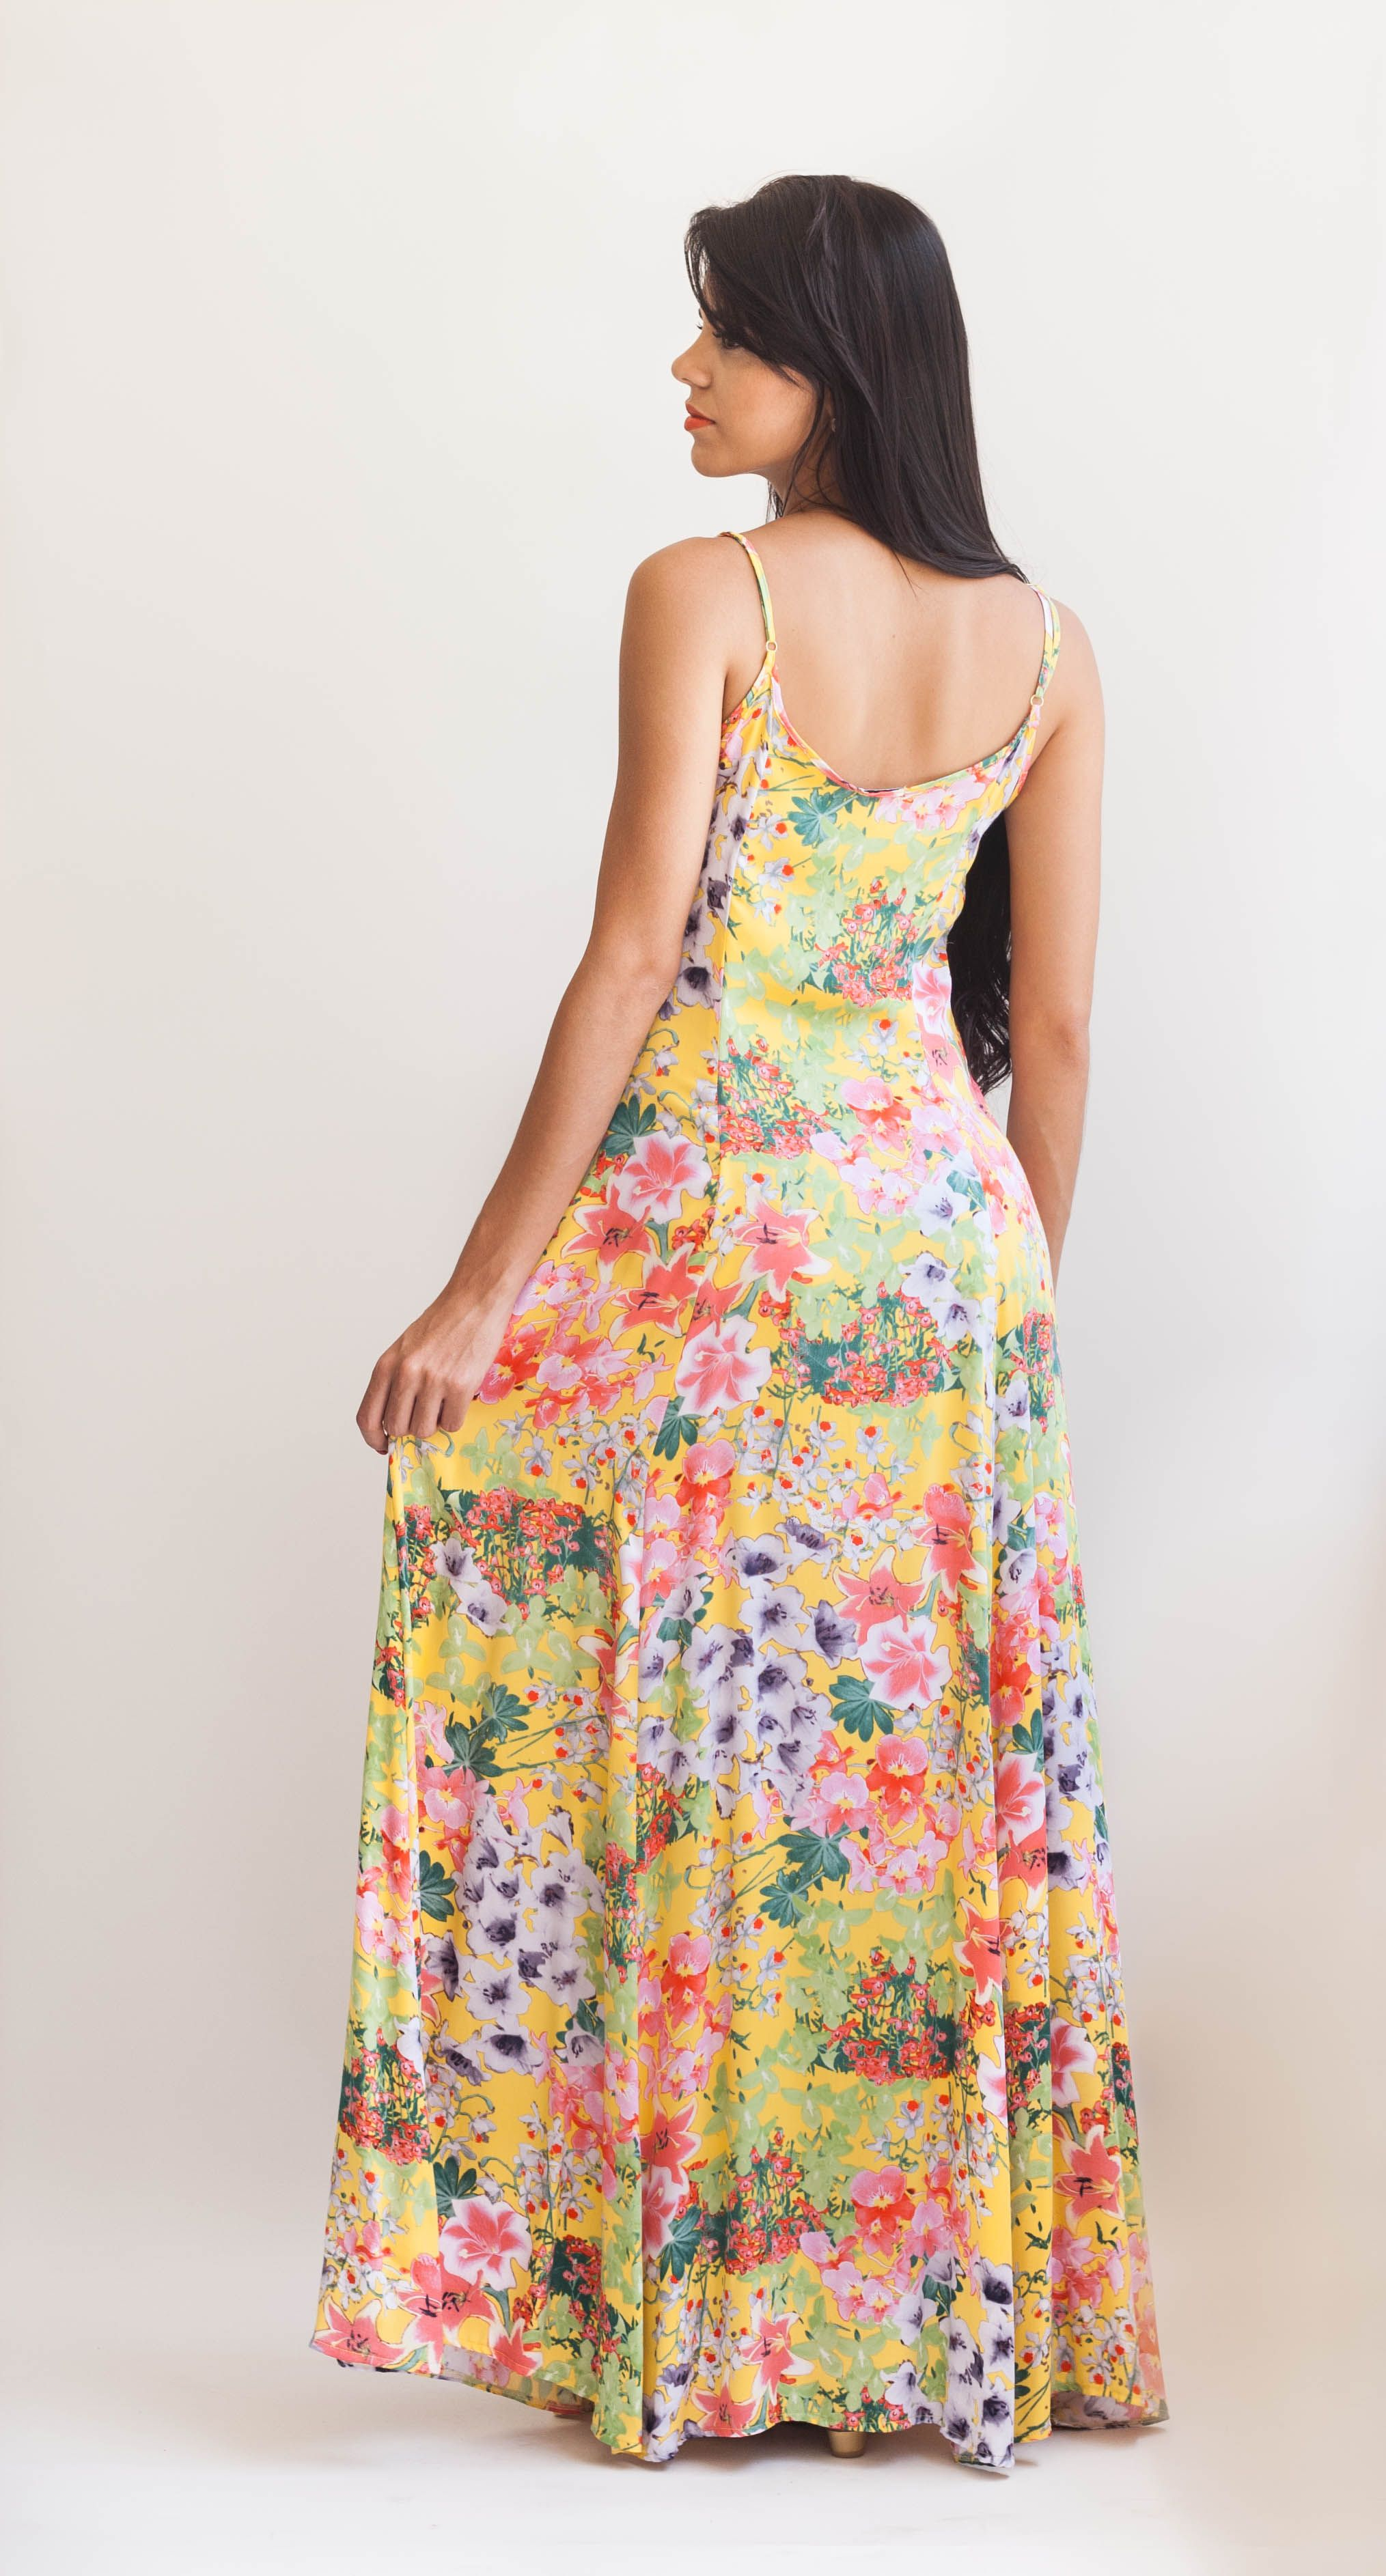 Ateliê Alexandrina - Vestido Longo Estampado | Maxi dress